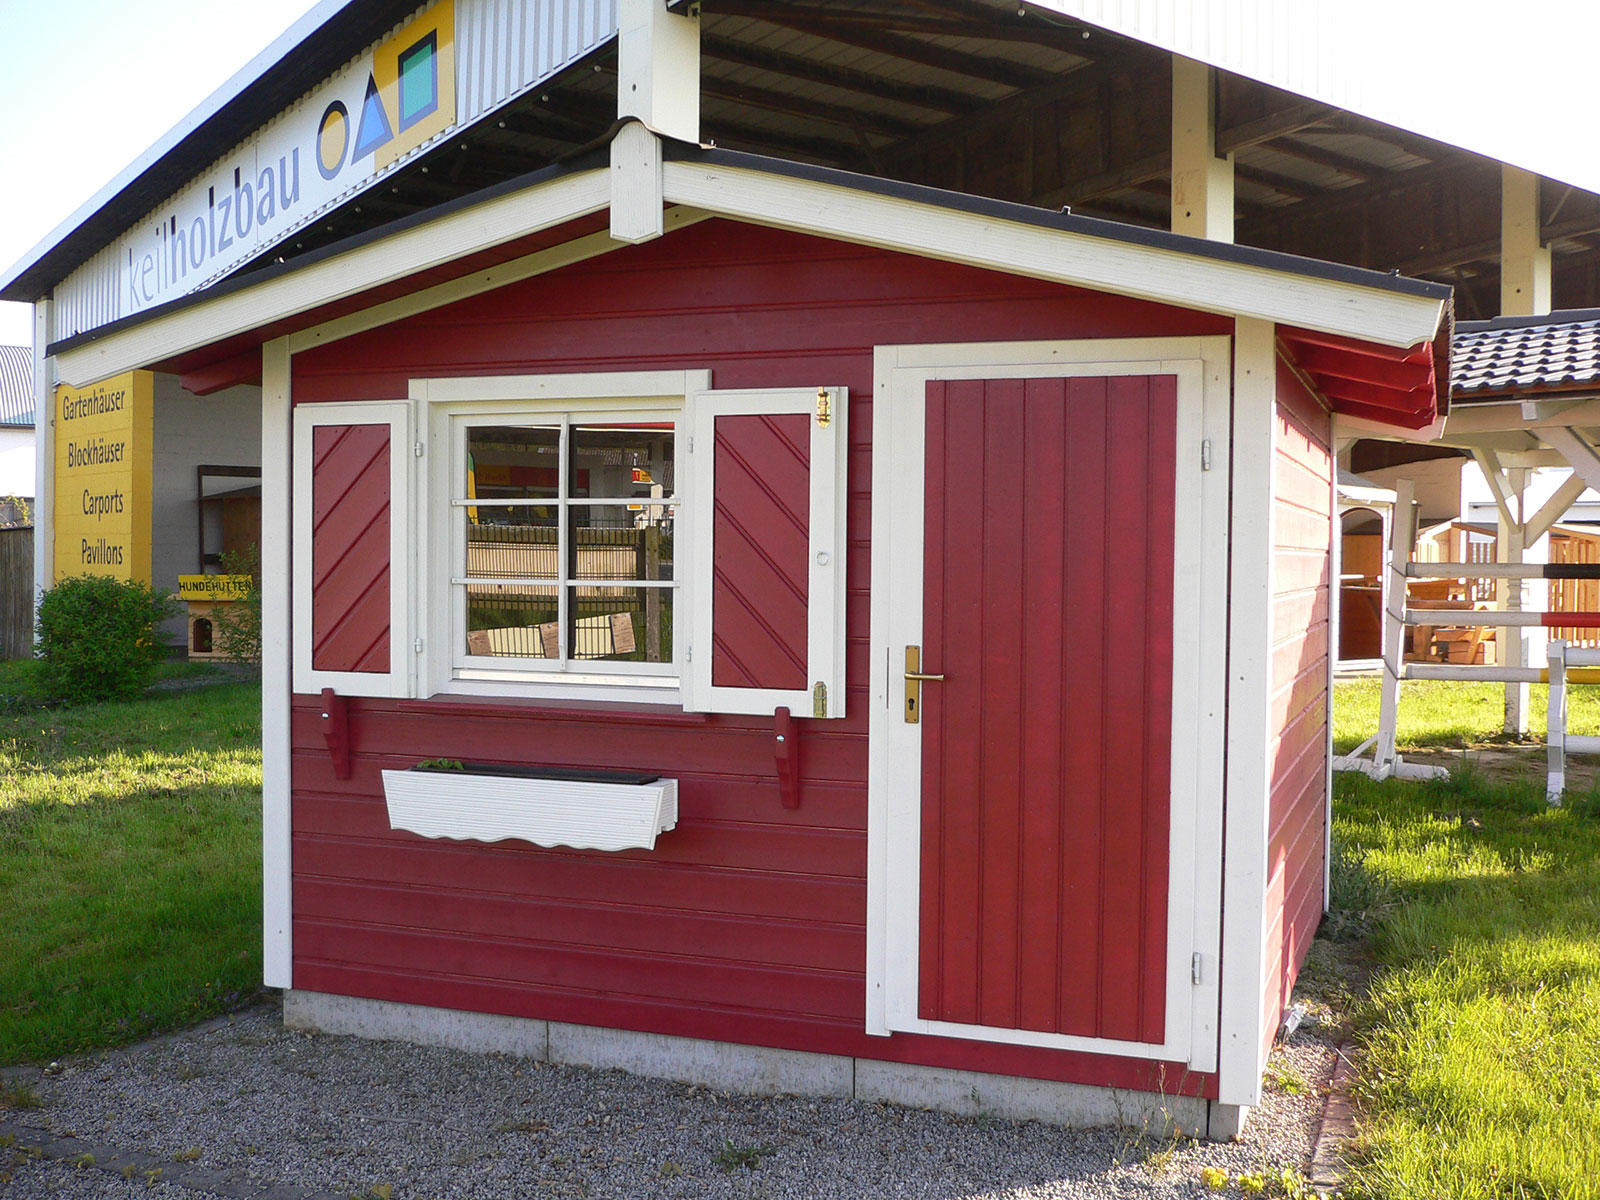 keilholzbau - gartenhaus, blockhaus, gerätehaus, pavillon, carport